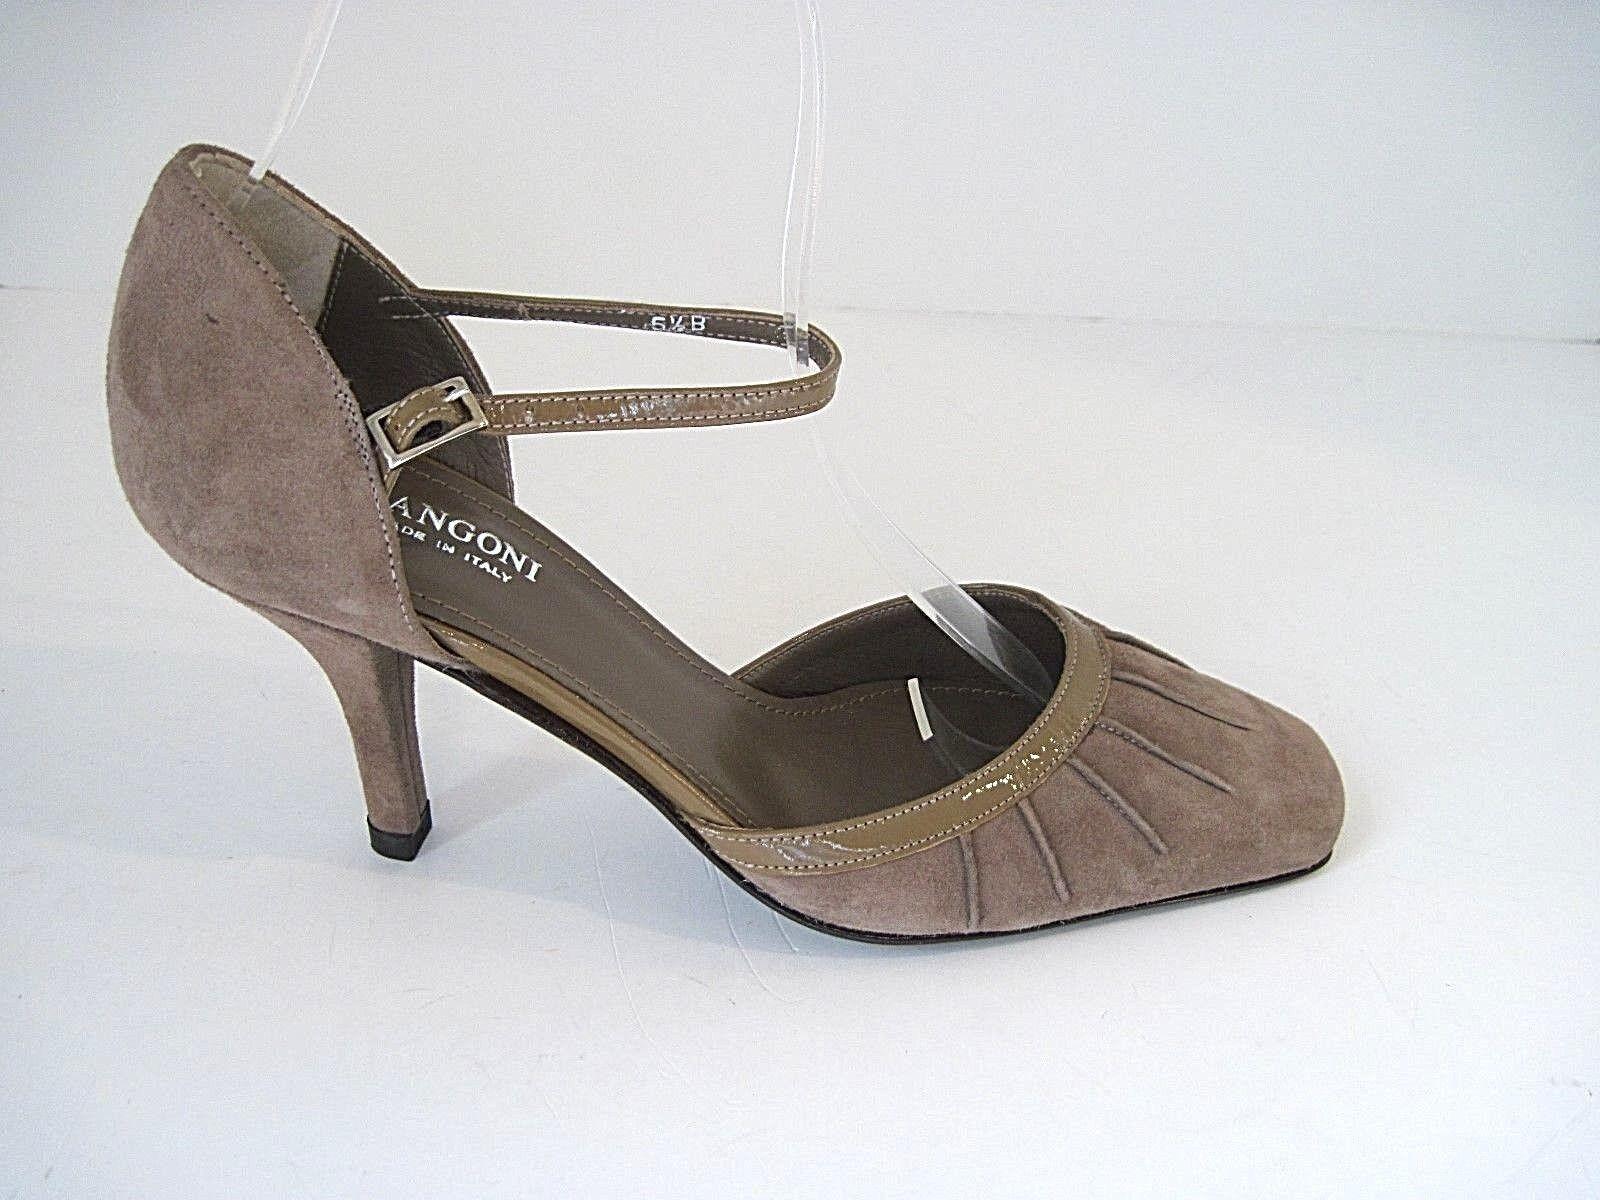 New Rangoni Taupe Suede Patent Leder Trim Heels Mary B Jane Größe 5 1/2 B Mary  75506d